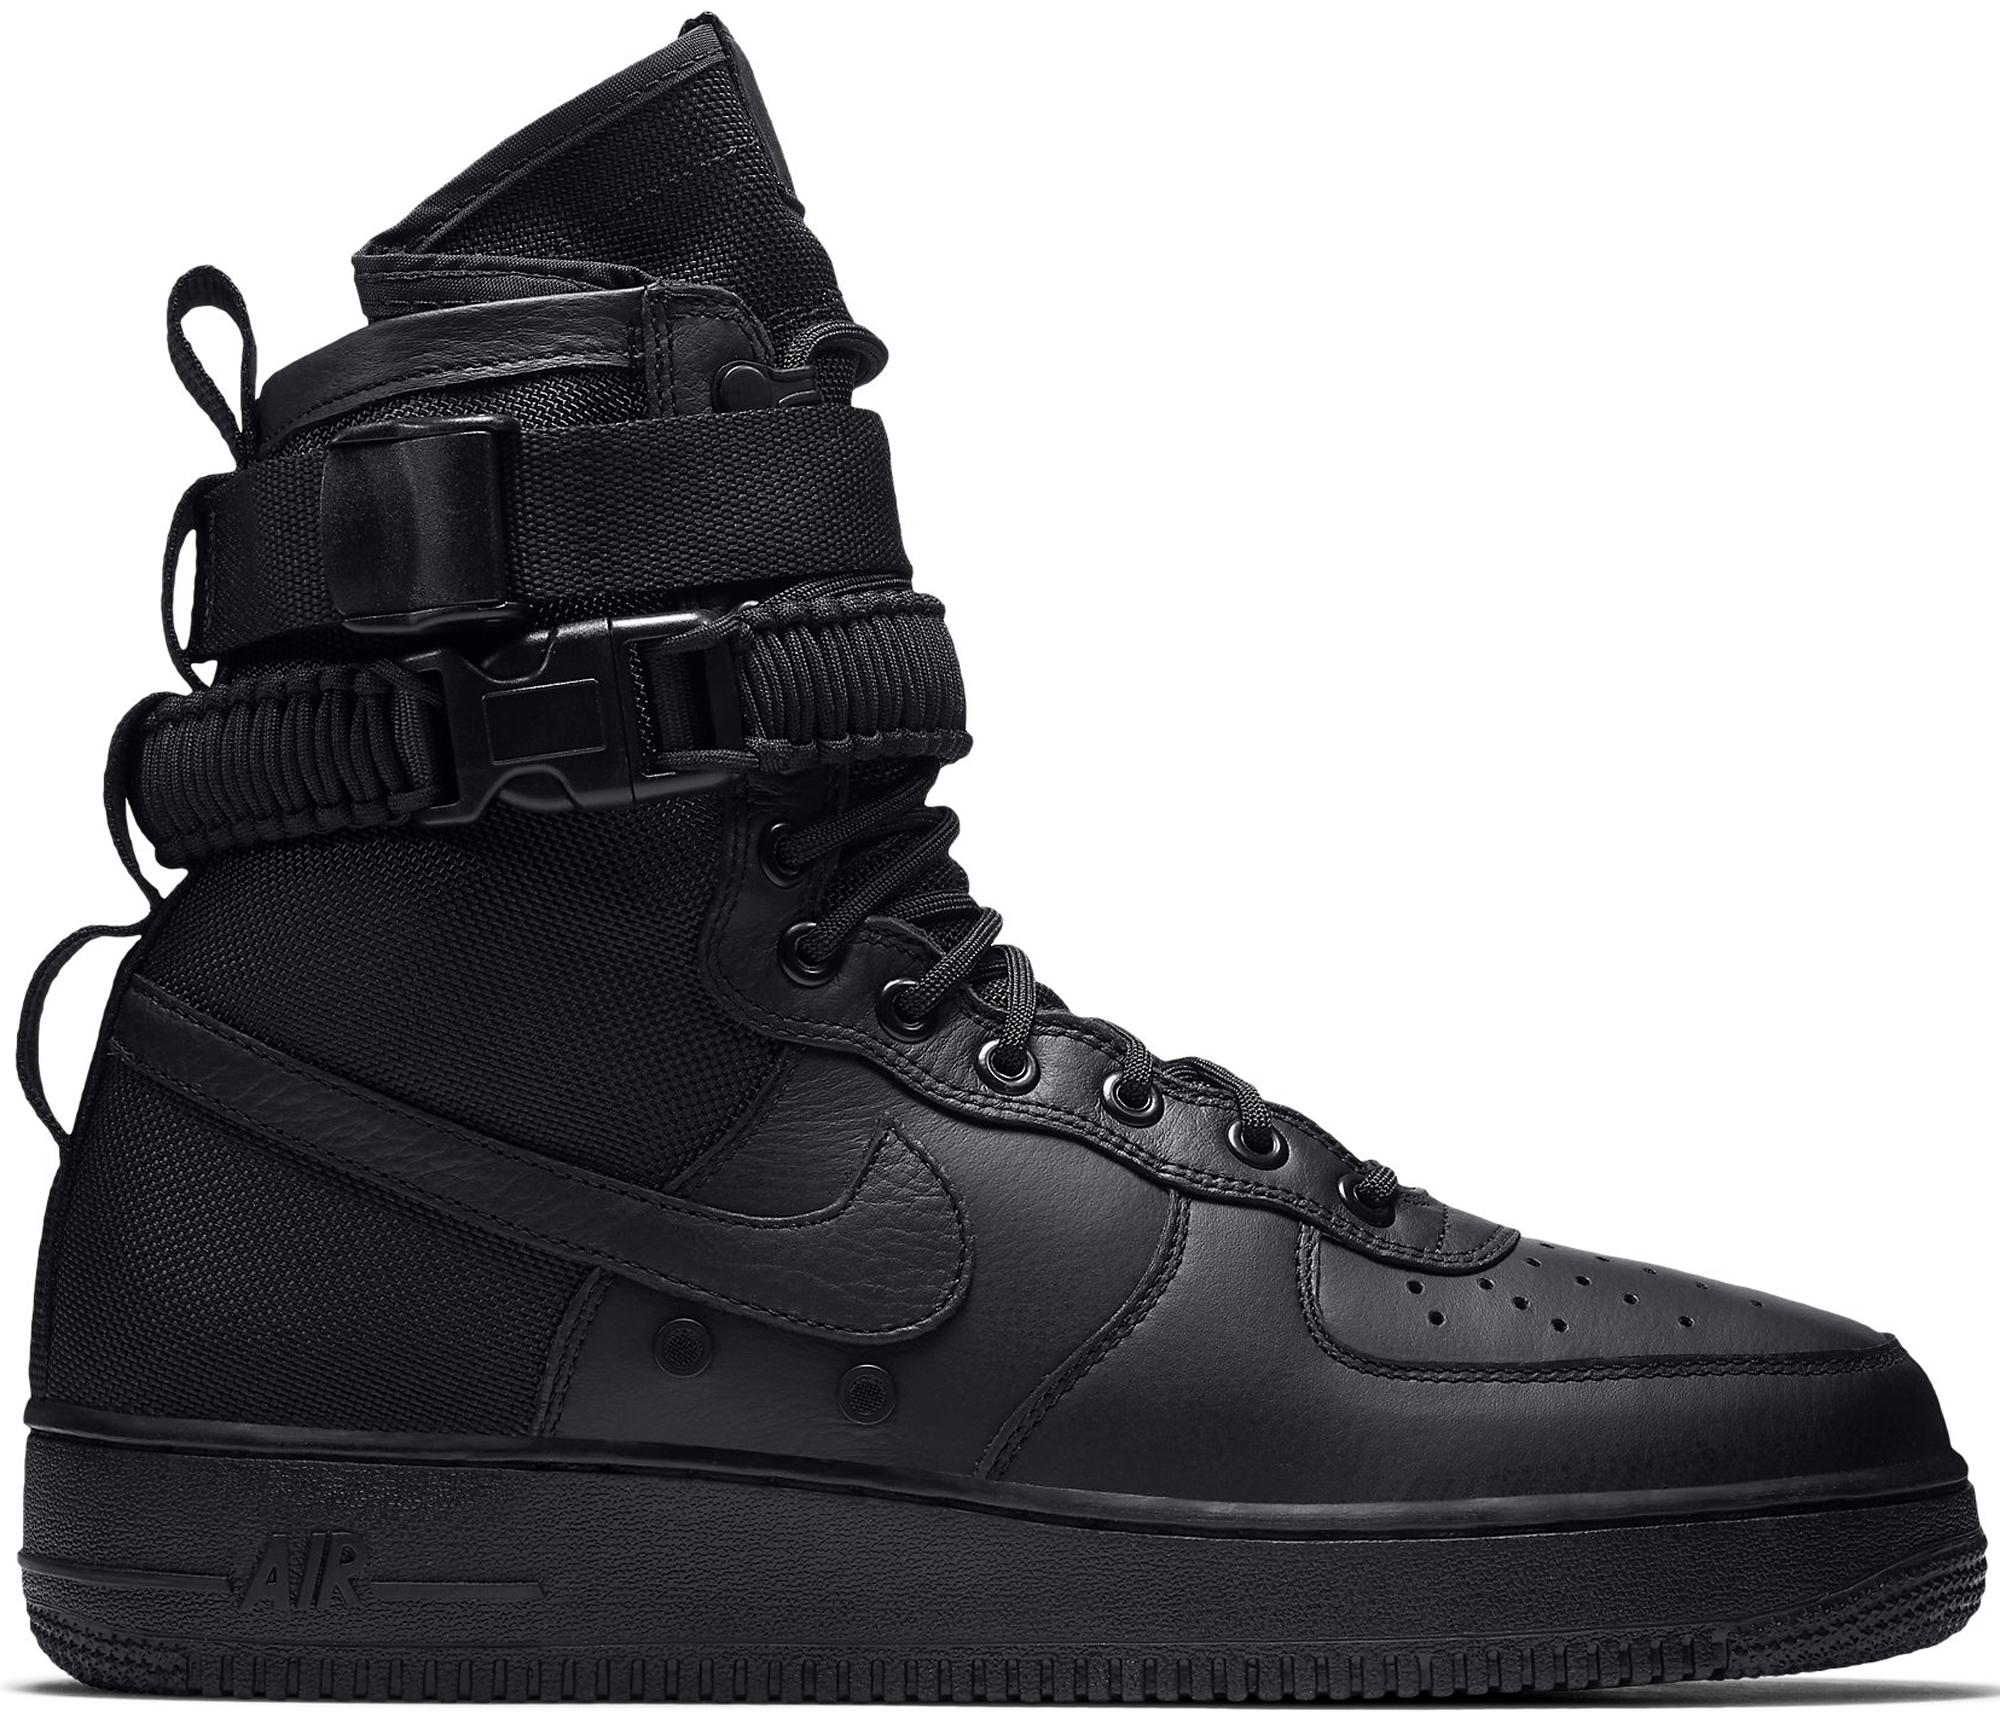 b36f2a6370a Nike Sb Trainerendor Khaki White Shoes Black Pants Nike Men s Stefan ...